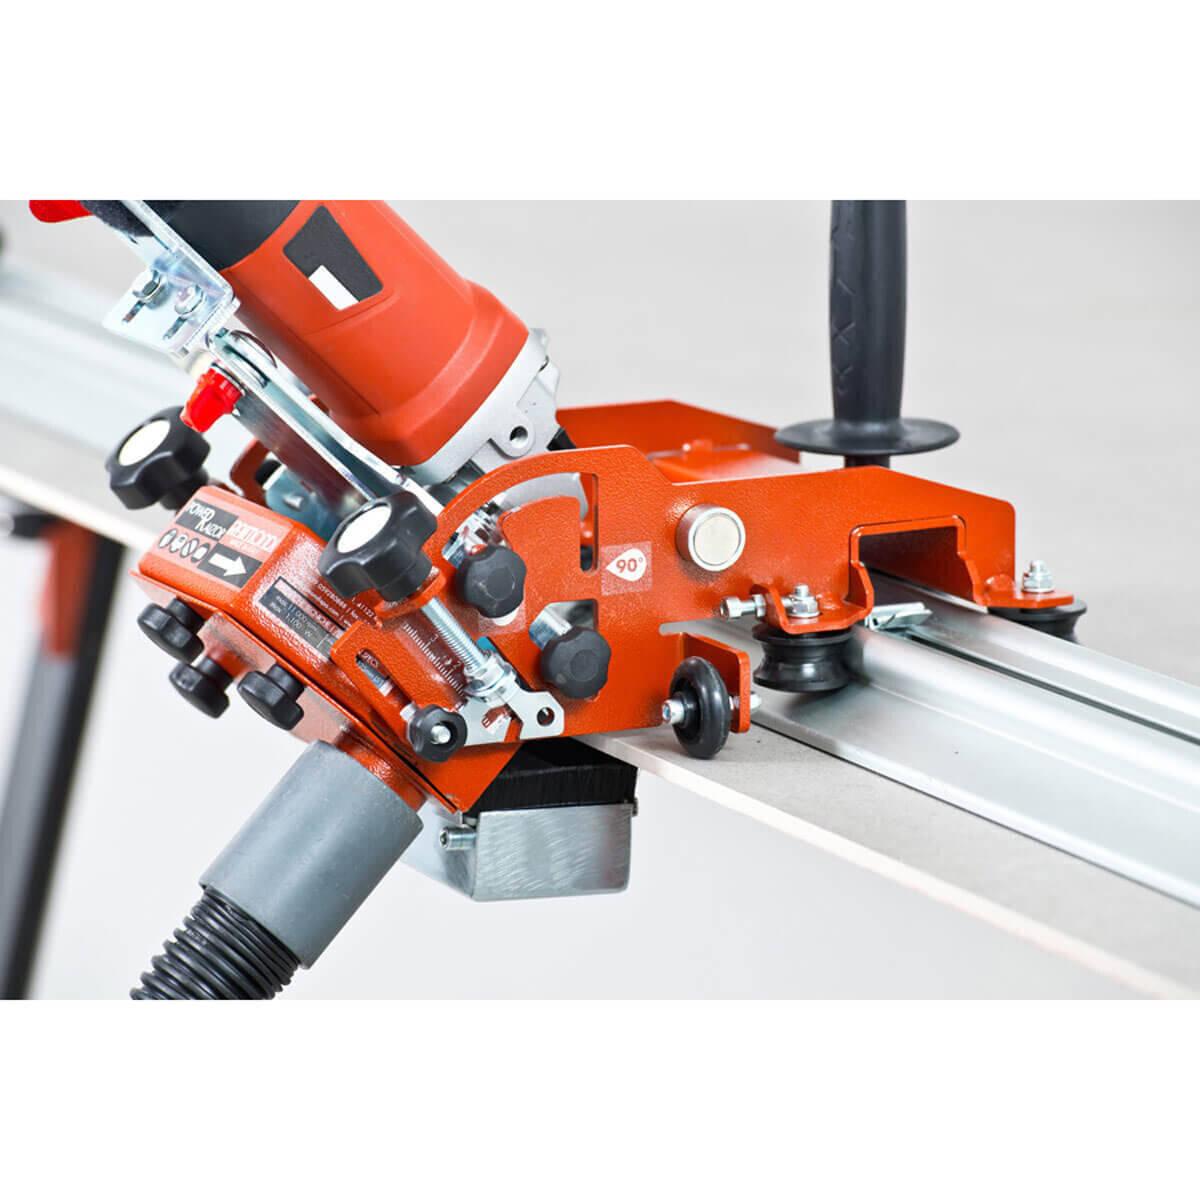 Dust Collector on Raizor Grinder Cart